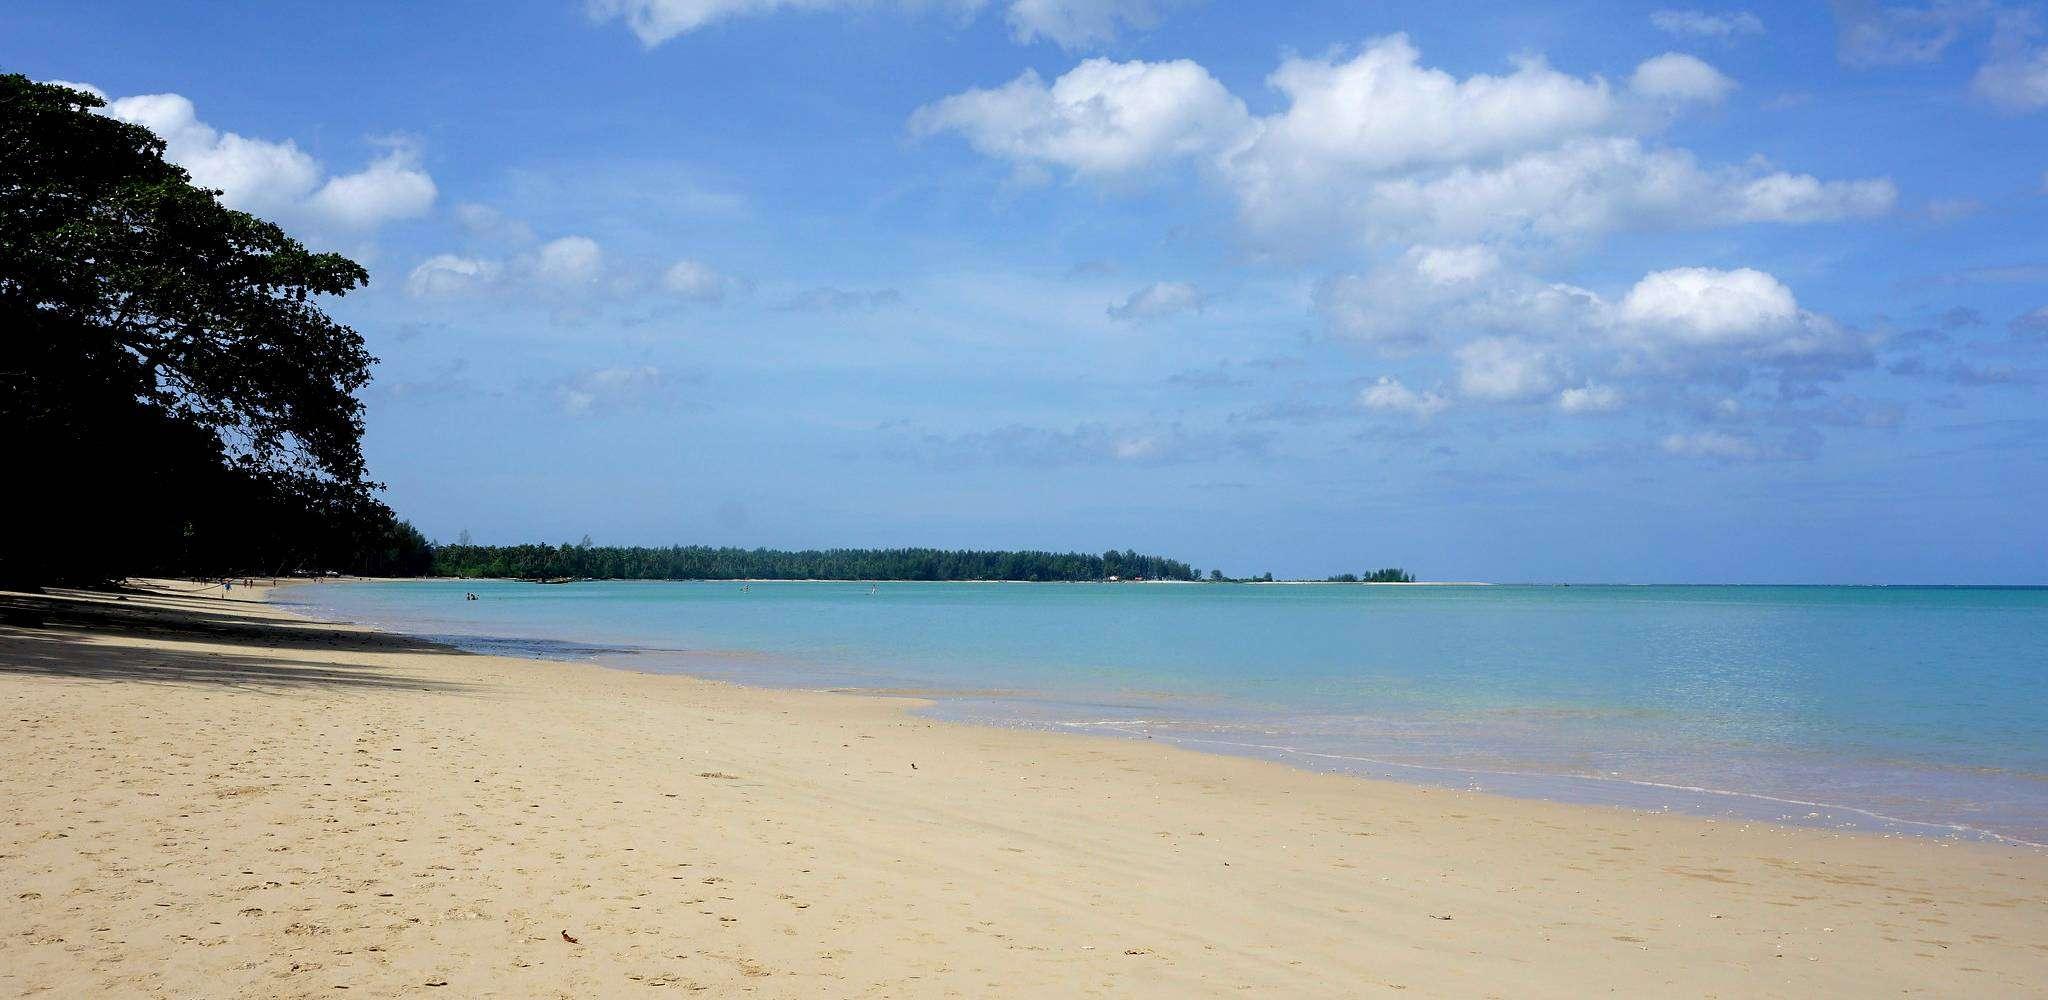 White Sand Beach and Coconut Beach, elongated white beach with blue sea